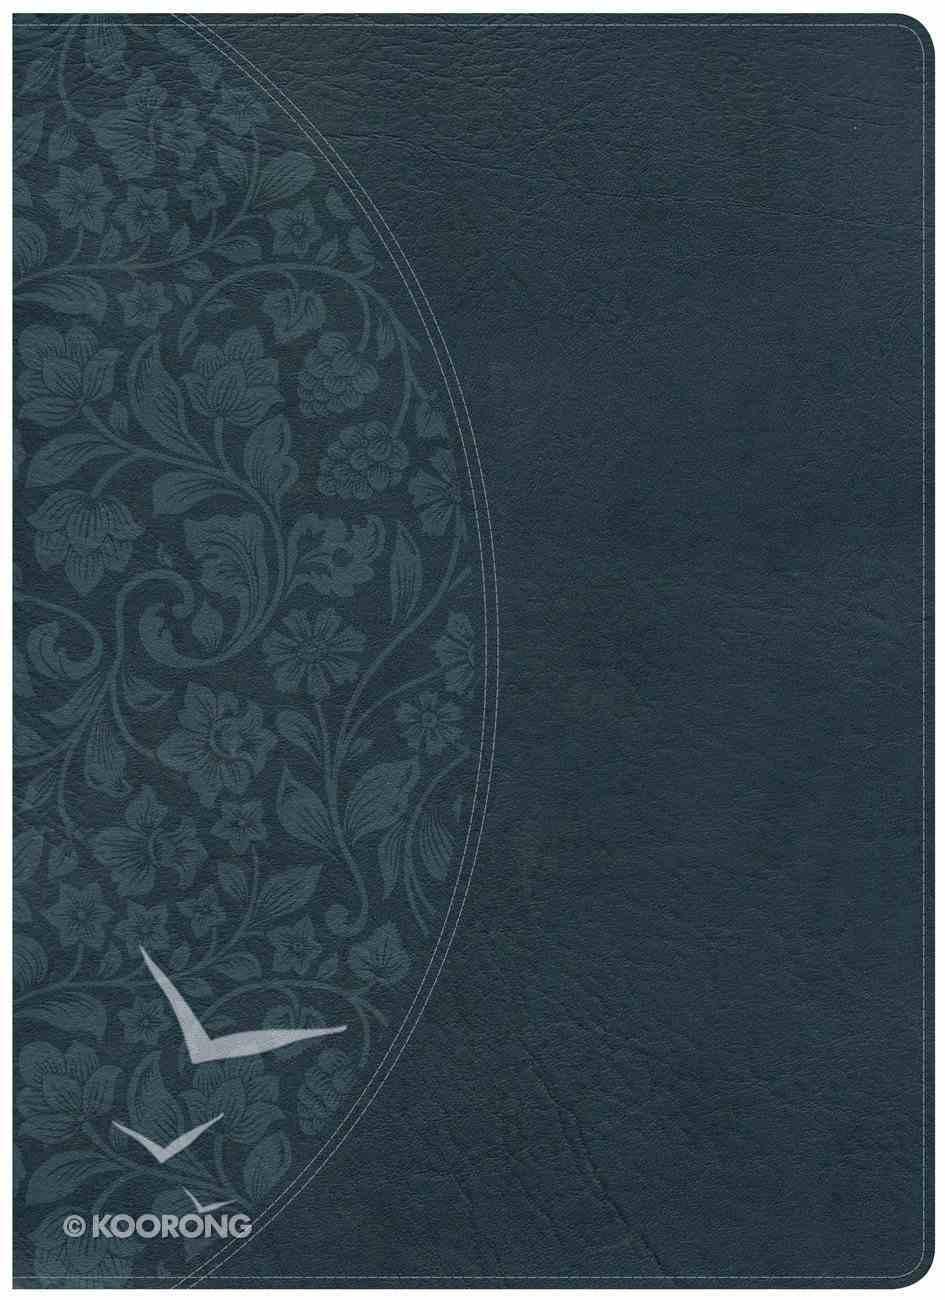 KJV Large Print Study Bible Dark Teal Indexed Imitation Leather